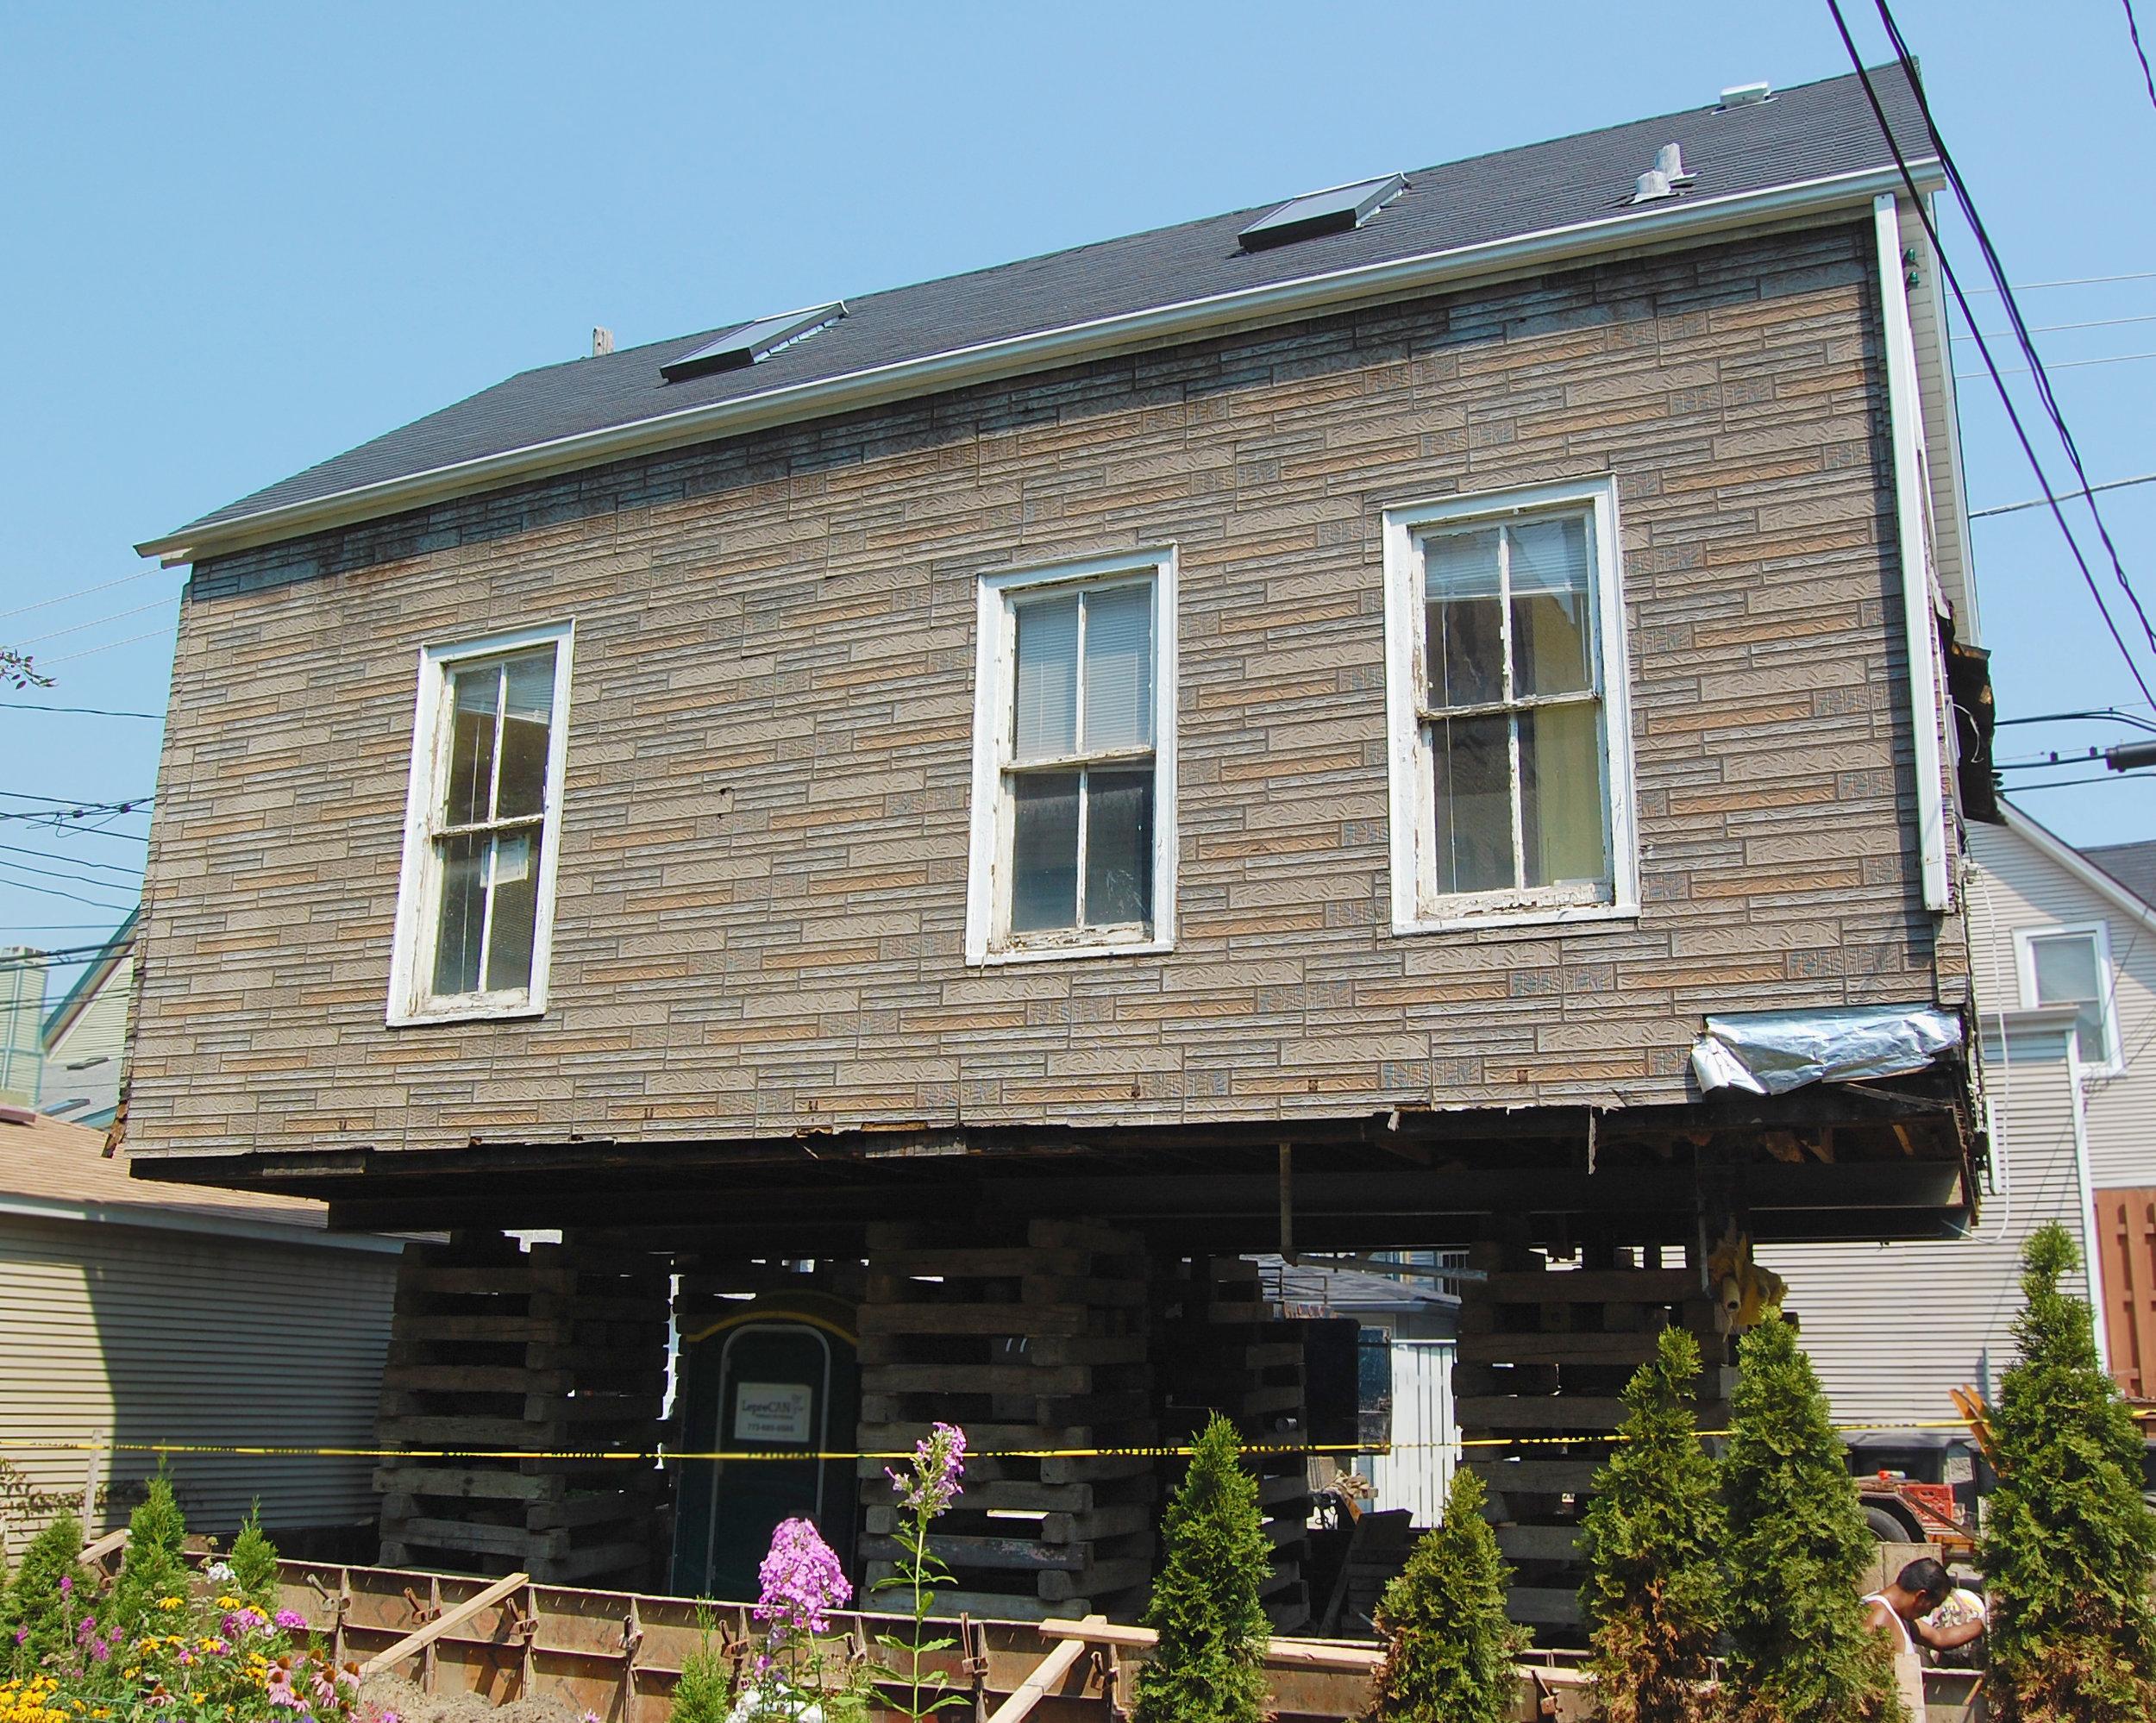 custom gut renovation single-family late-ninteenth-century coach house residential home, building raised on stilts, under construction